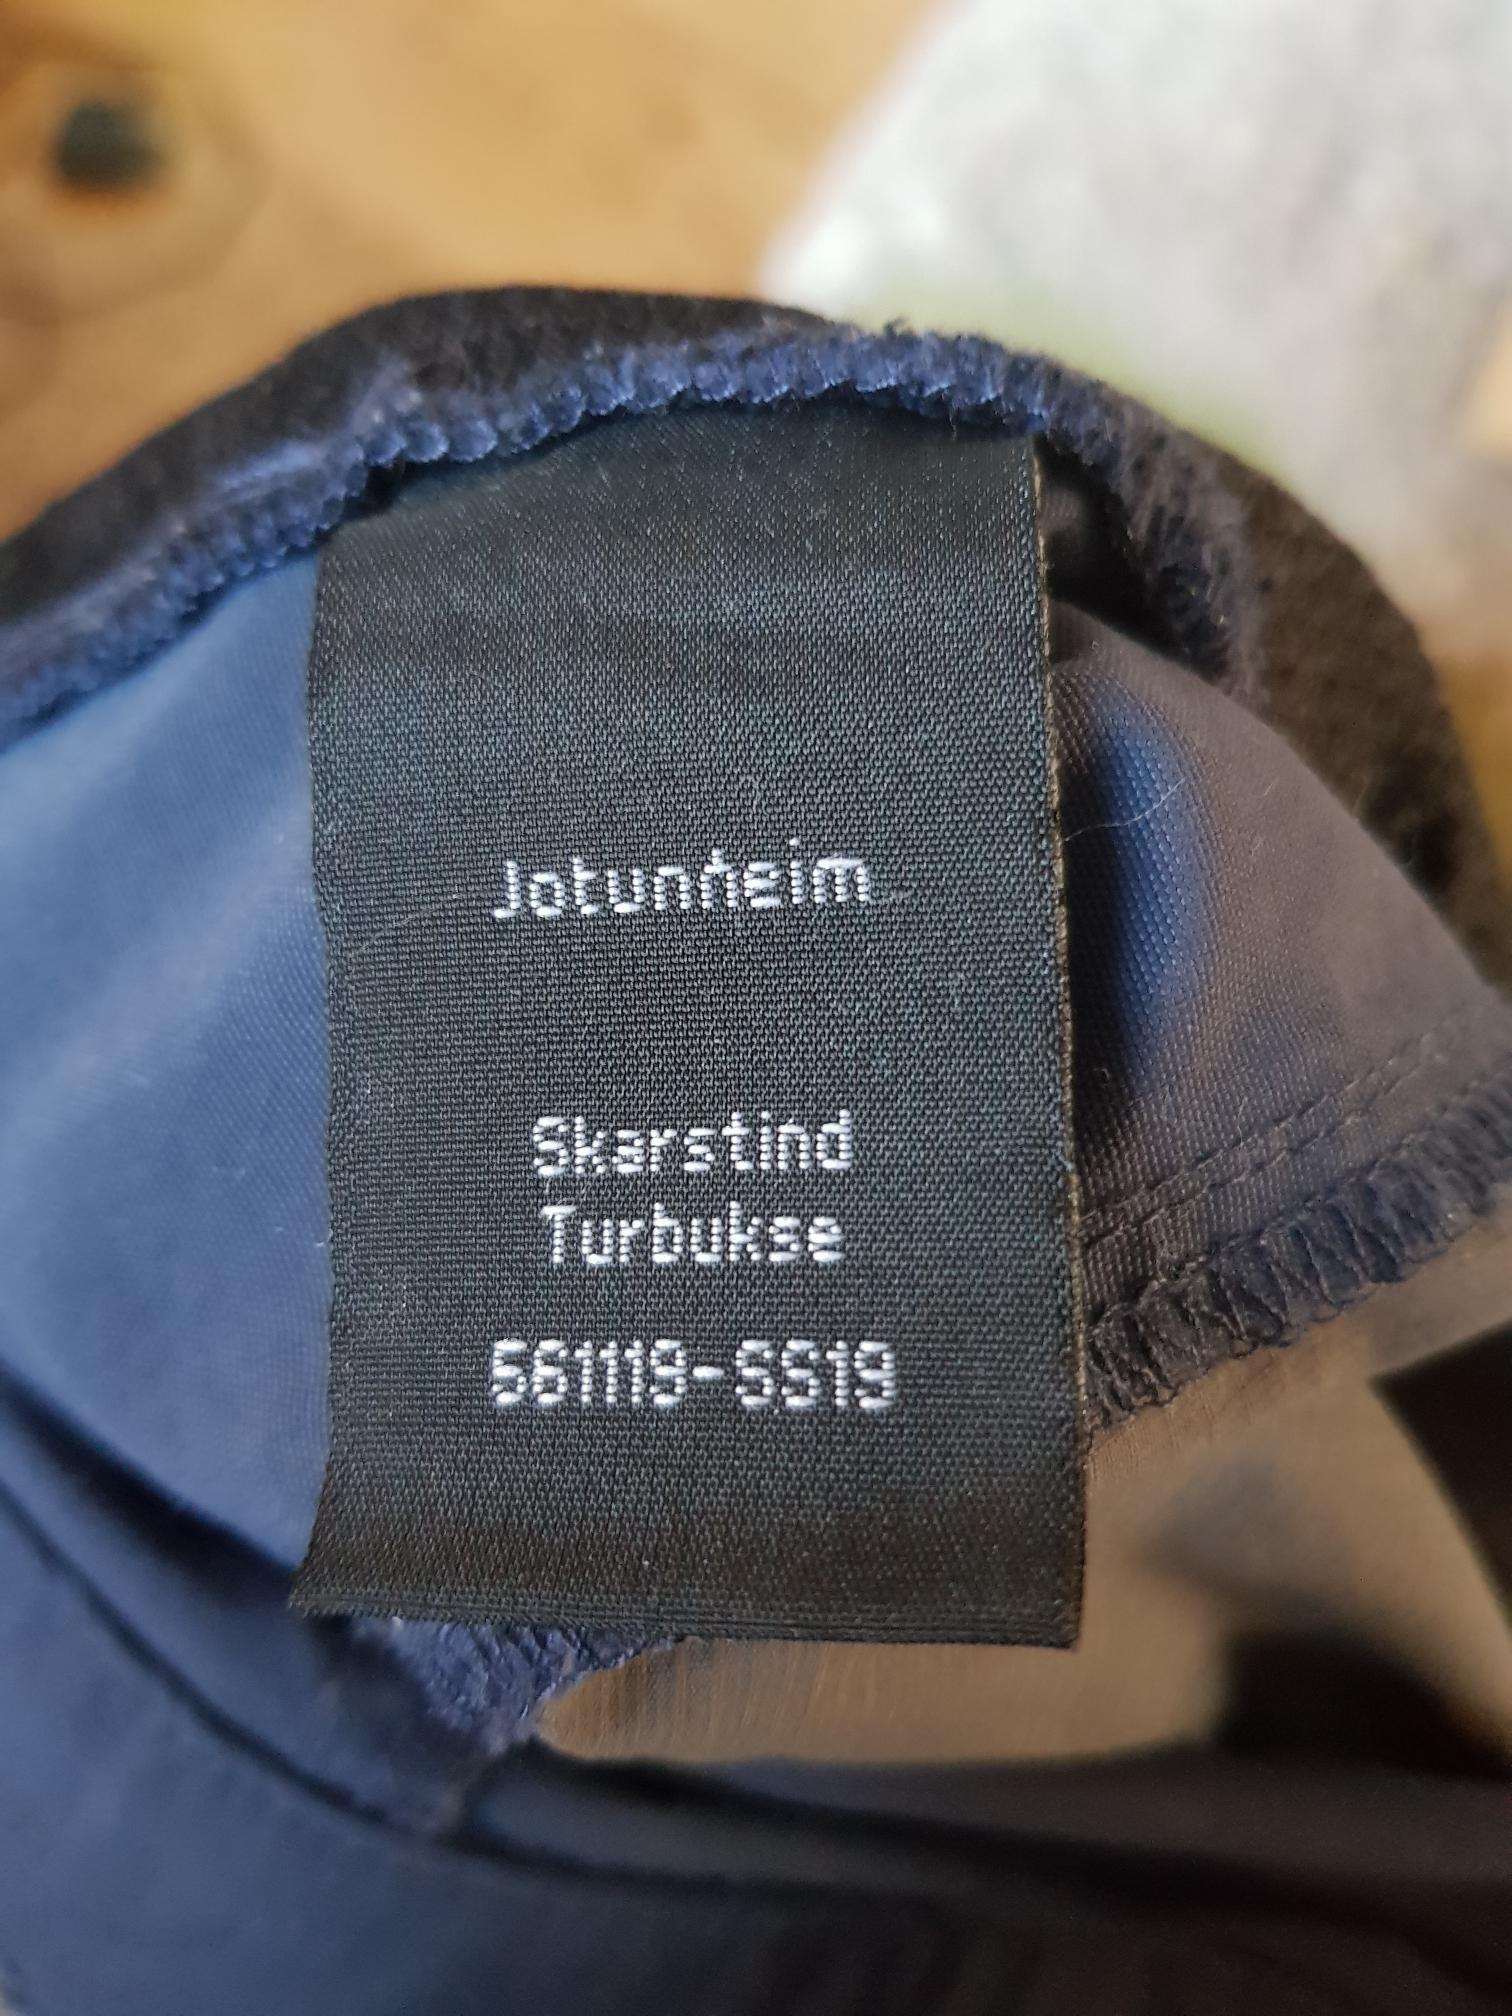 Jotunheim Skarstind turbukse selges | FINN.no